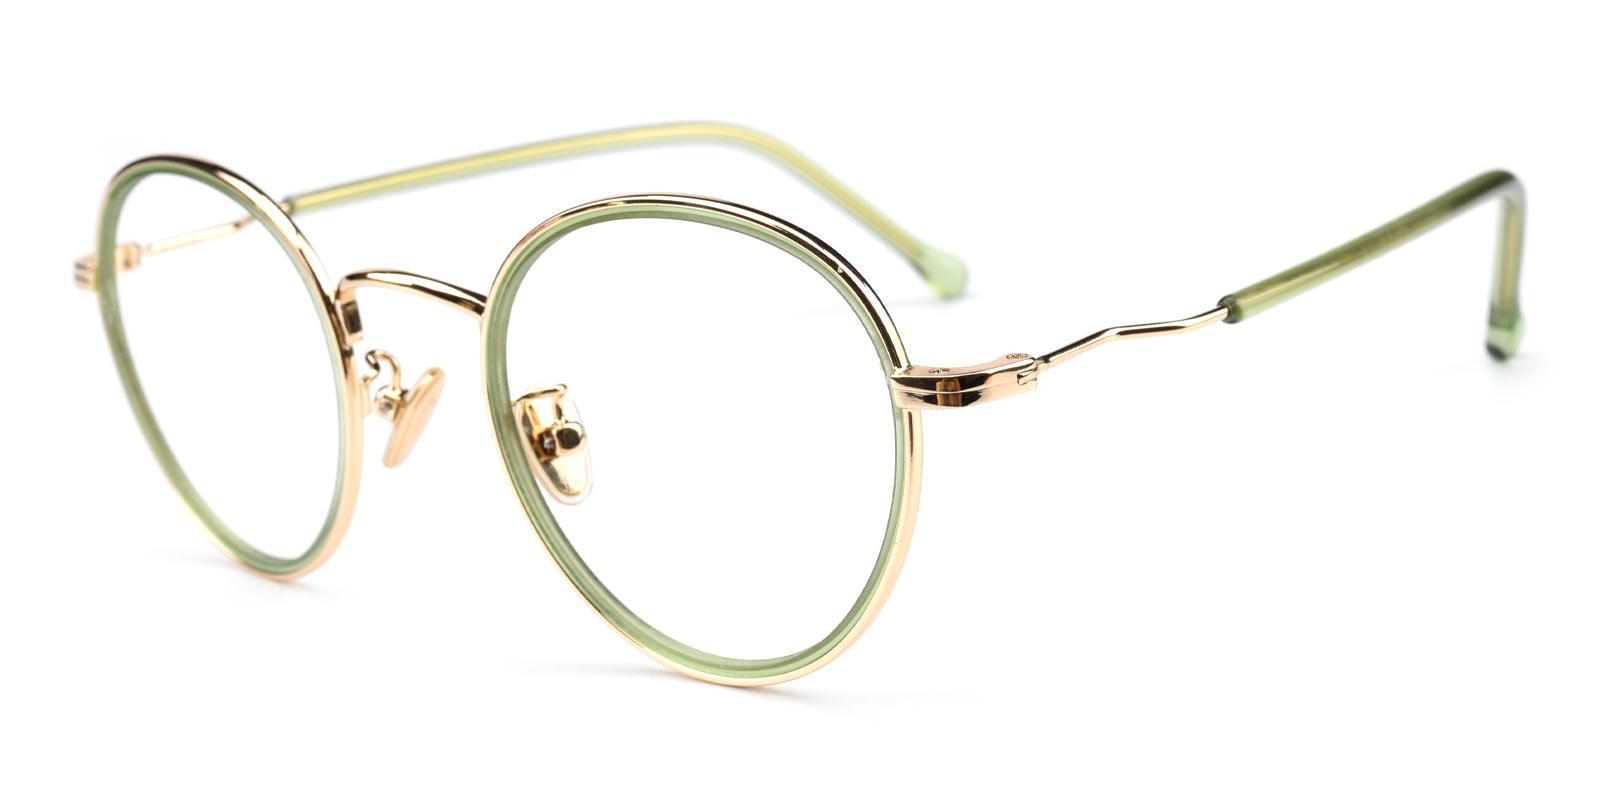 Jenny-Green-Round-Combination-Eyeglasses-detail